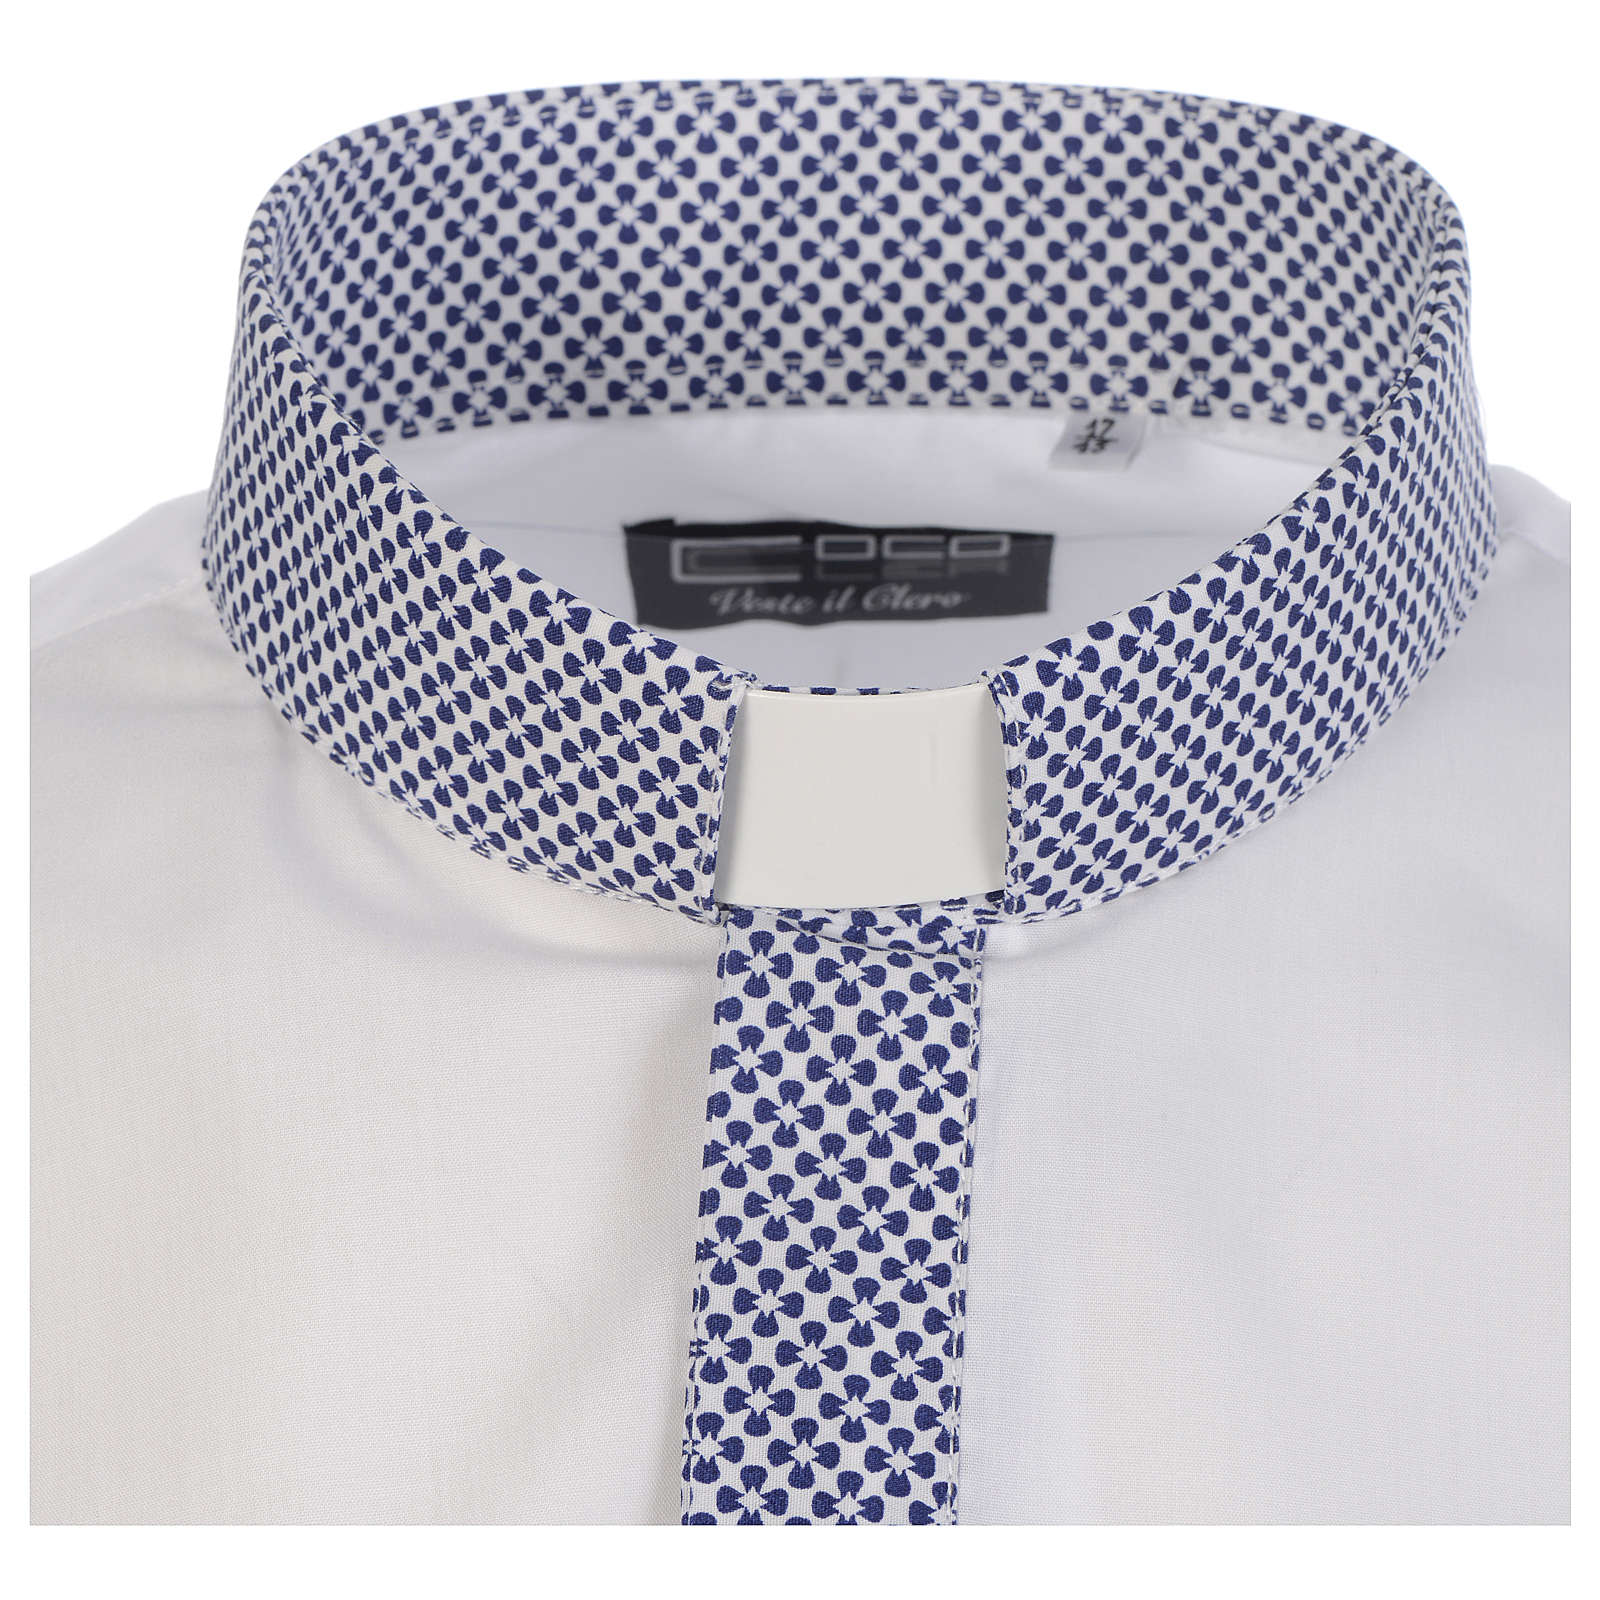 Camisa de sacerdote contraste cruzes branco manga longa 4